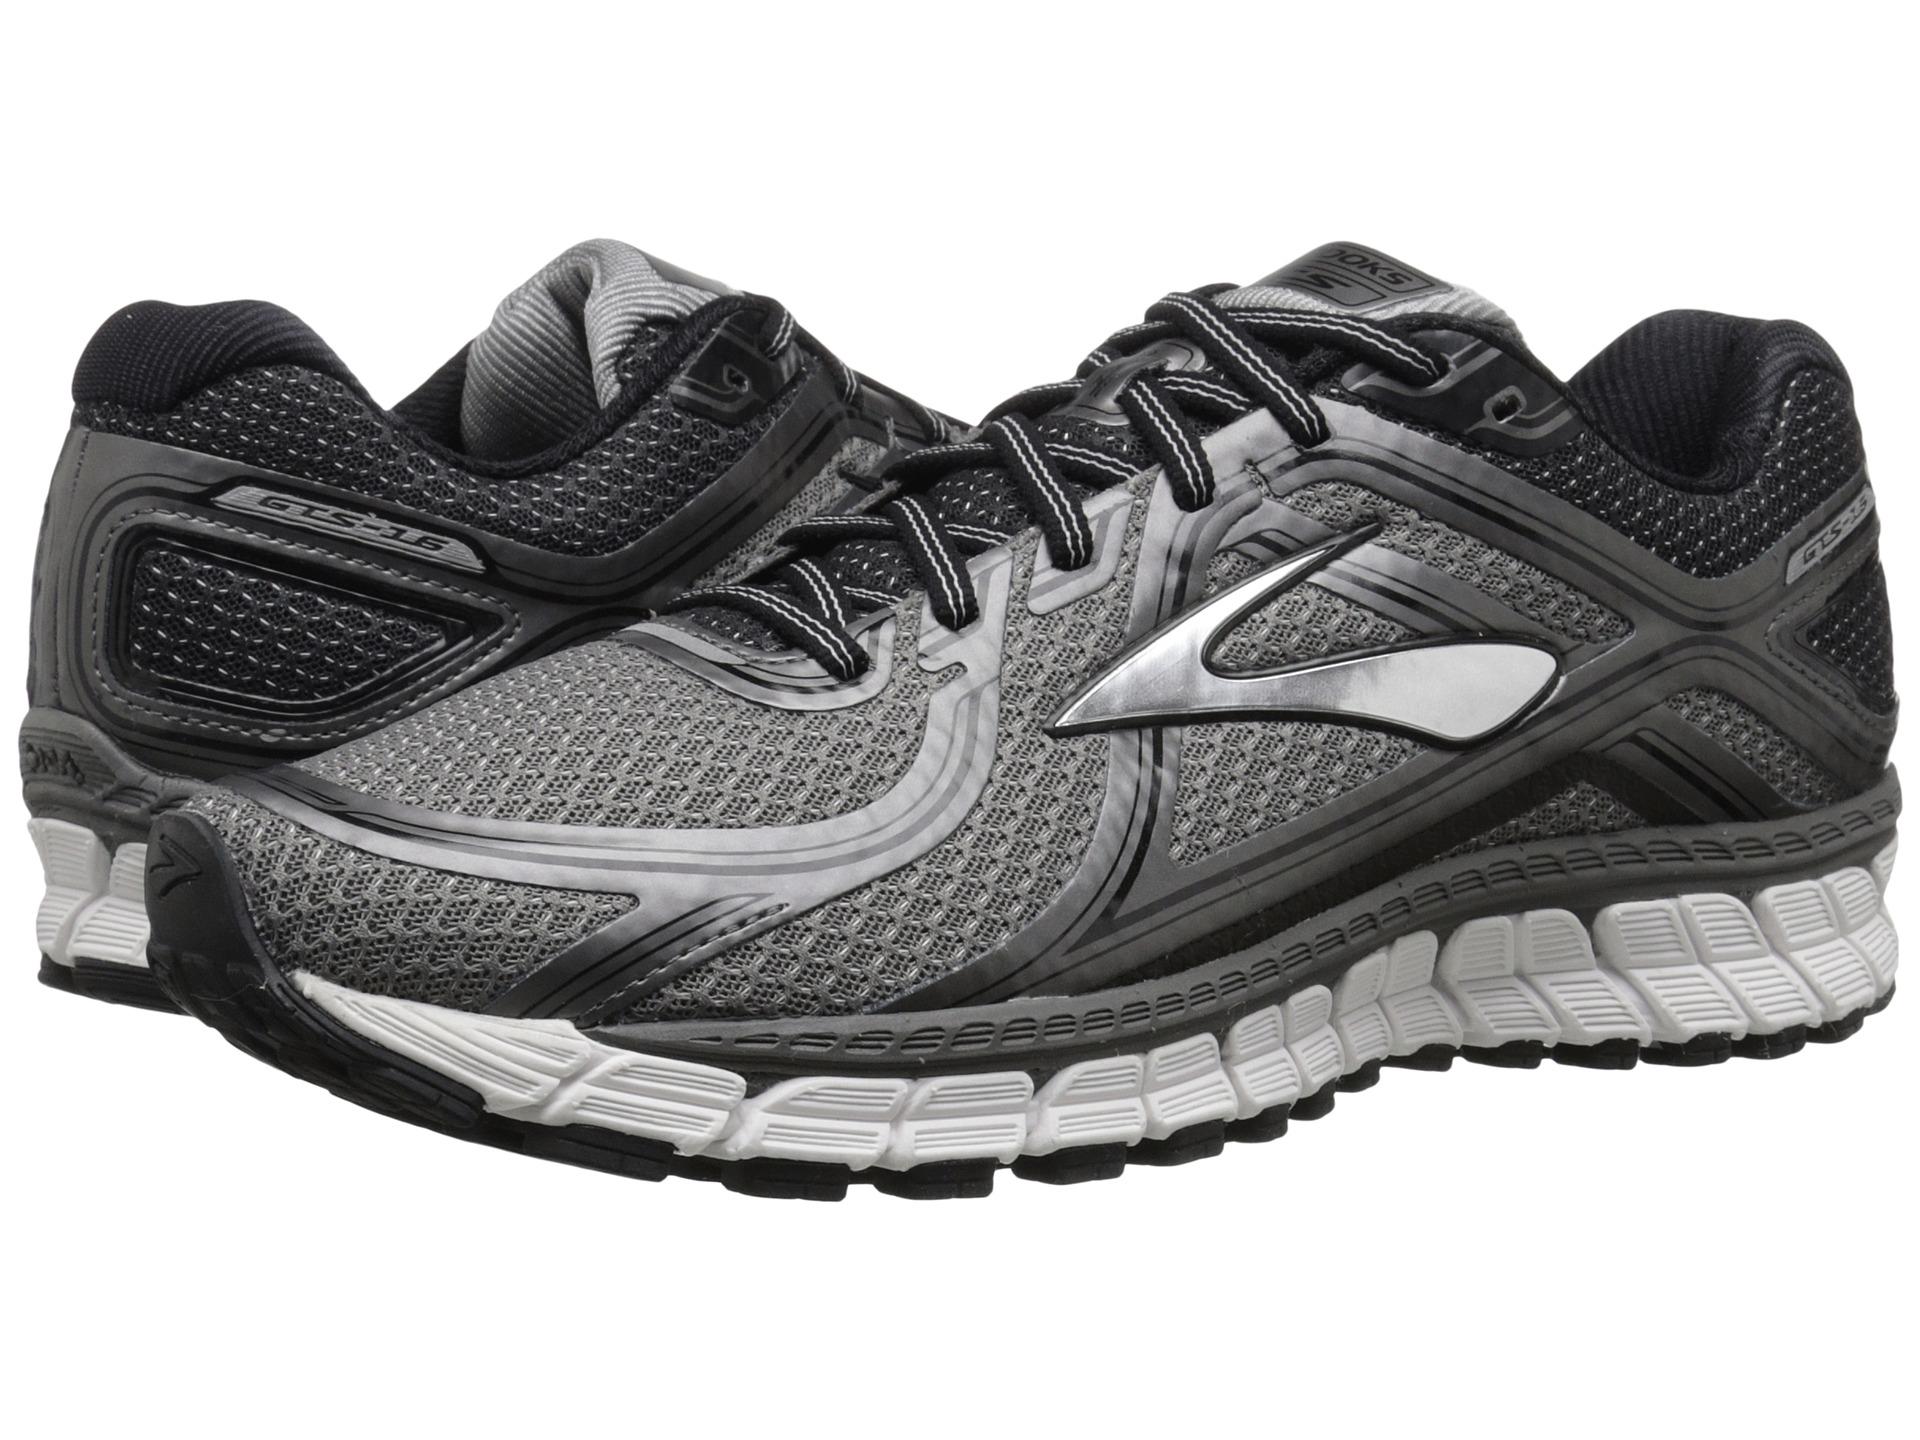 Provide Mens Running Shoes - Brooks Adrenaline Gts 16 Metallic Grey/Black/Silver